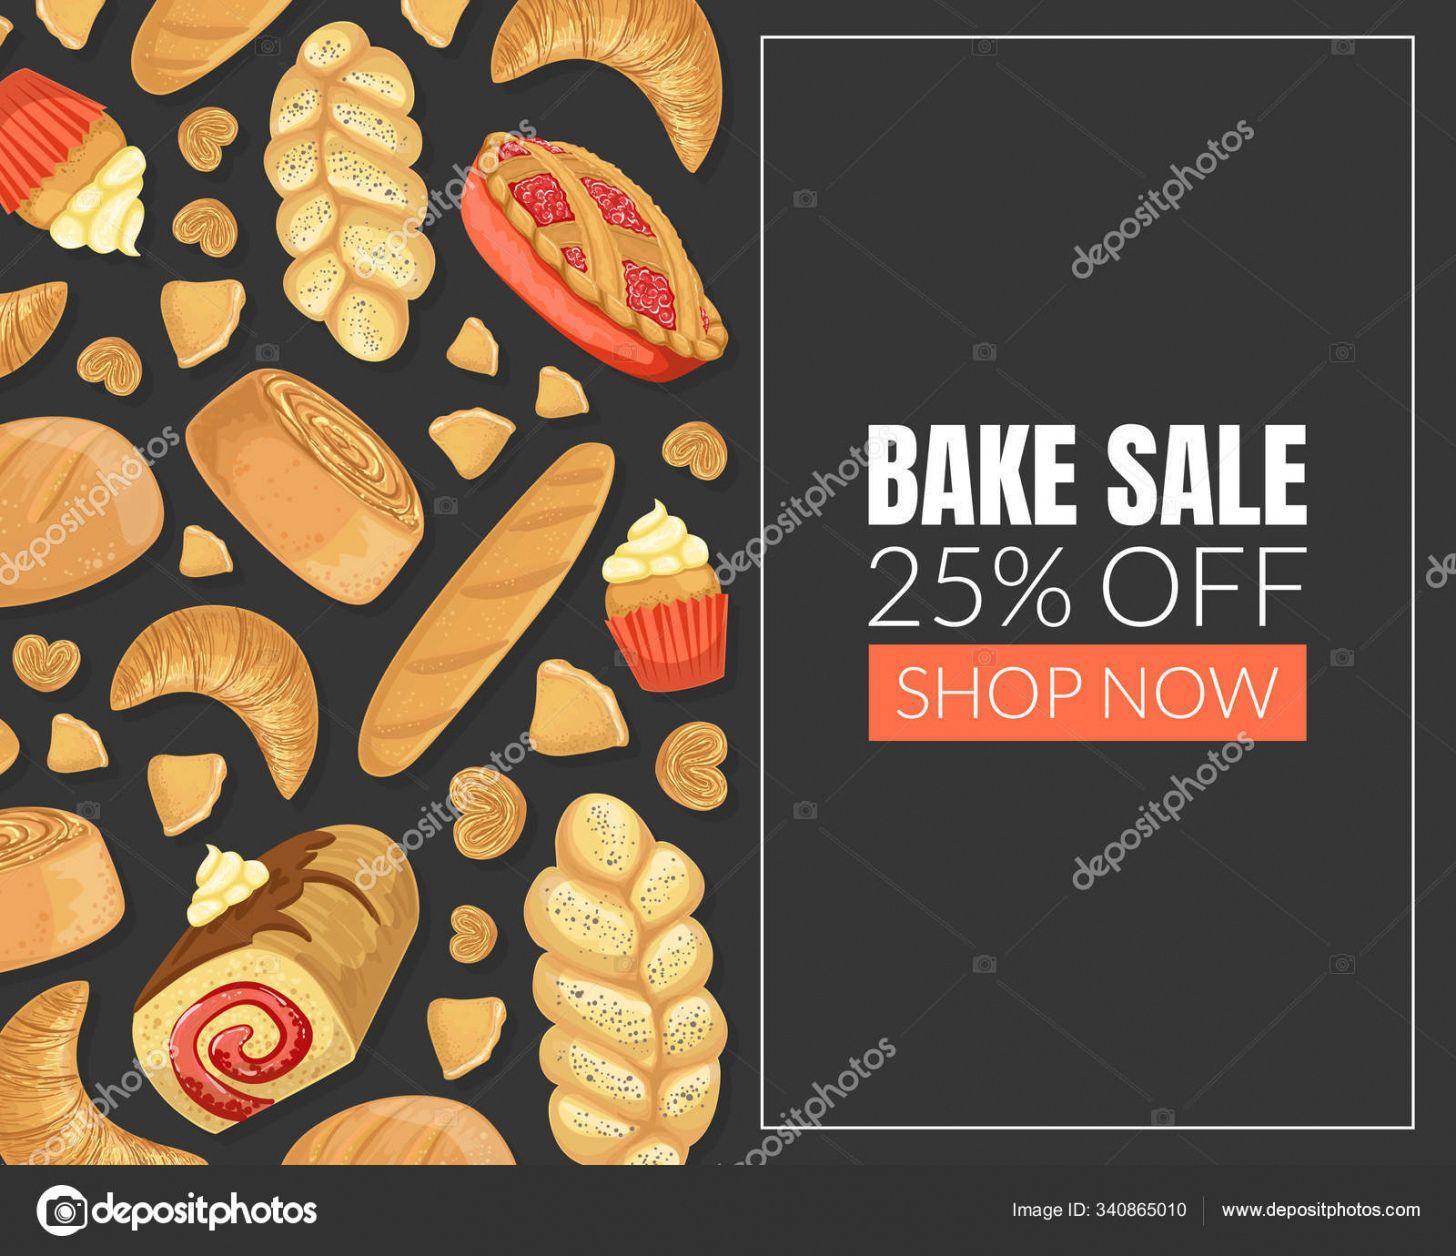 editable ᐈ bake sale poster templates stock vectors royalty free bake sale menu template word